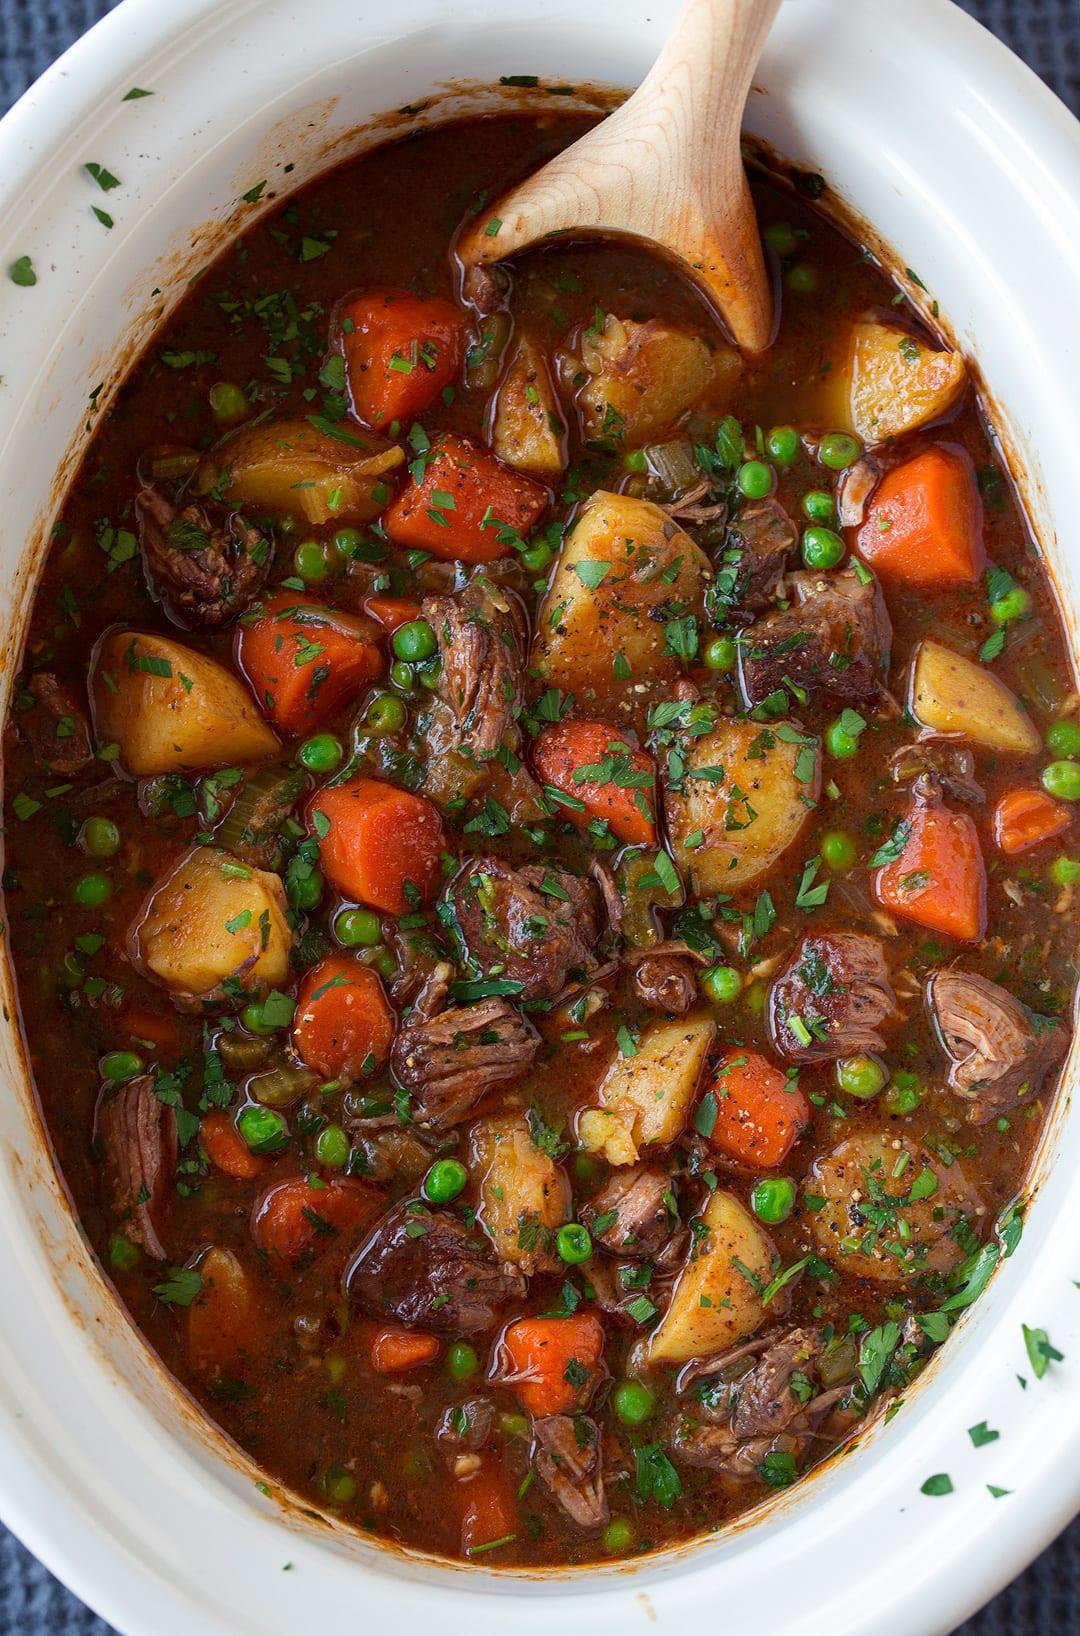 Best Slow Cooker Beef Stew  Slow Cooker Beef Stew Cooking Classy